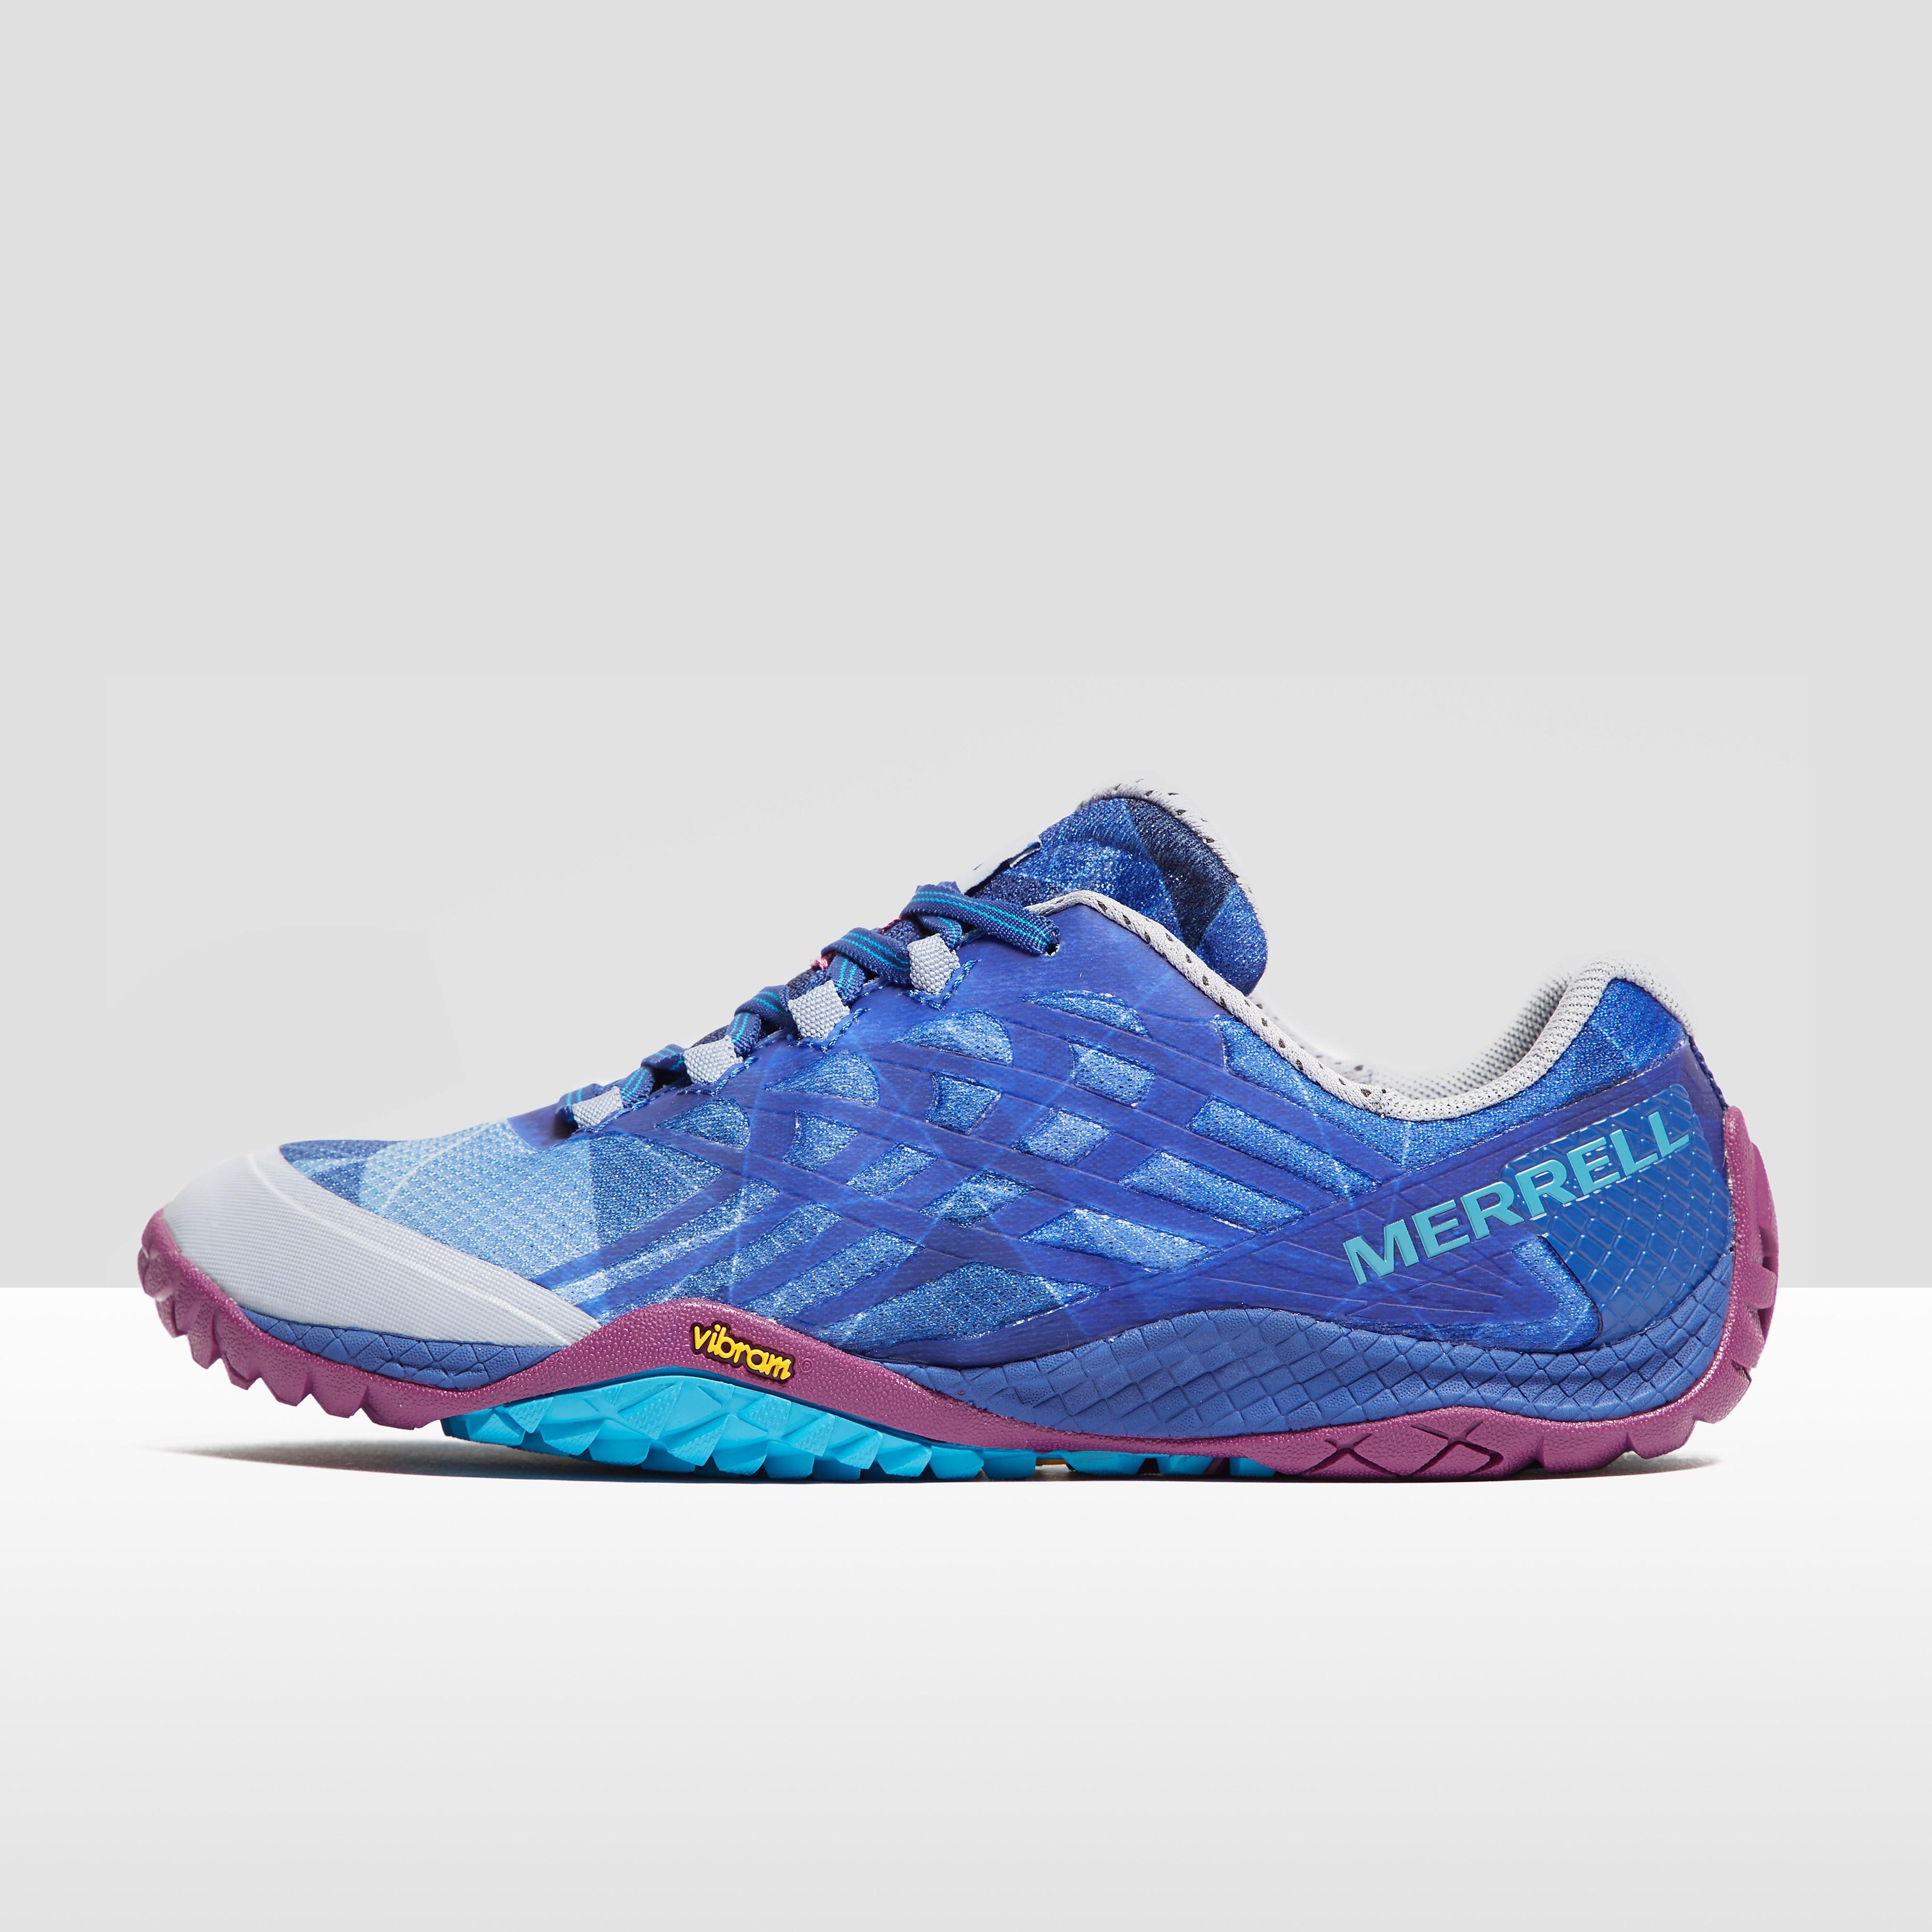 Merrell Trail Glove 4 Women's Trial Running Shoes